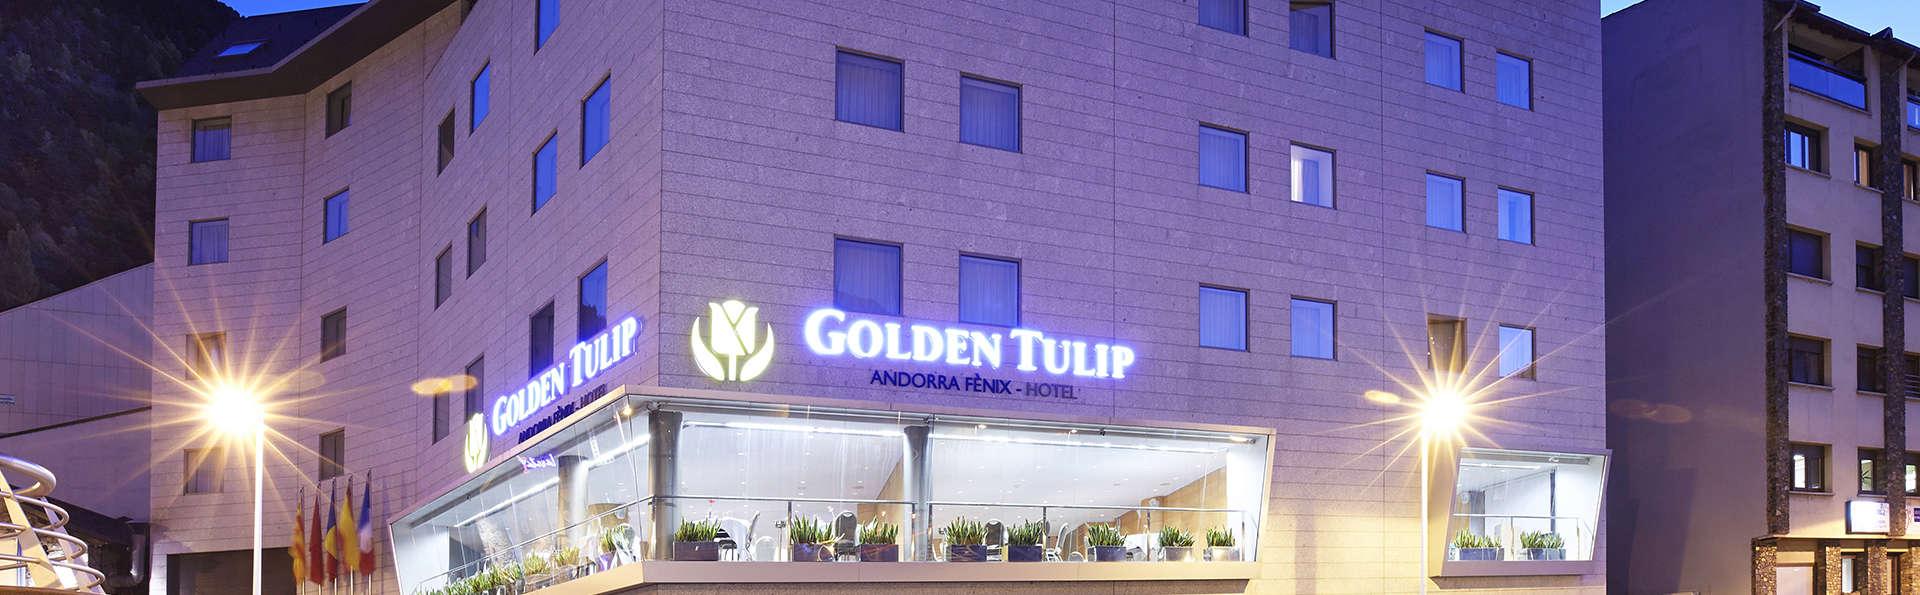 Golden Tulip Andorra Fènix Hotel - EDIT_FRONT_1.jpg